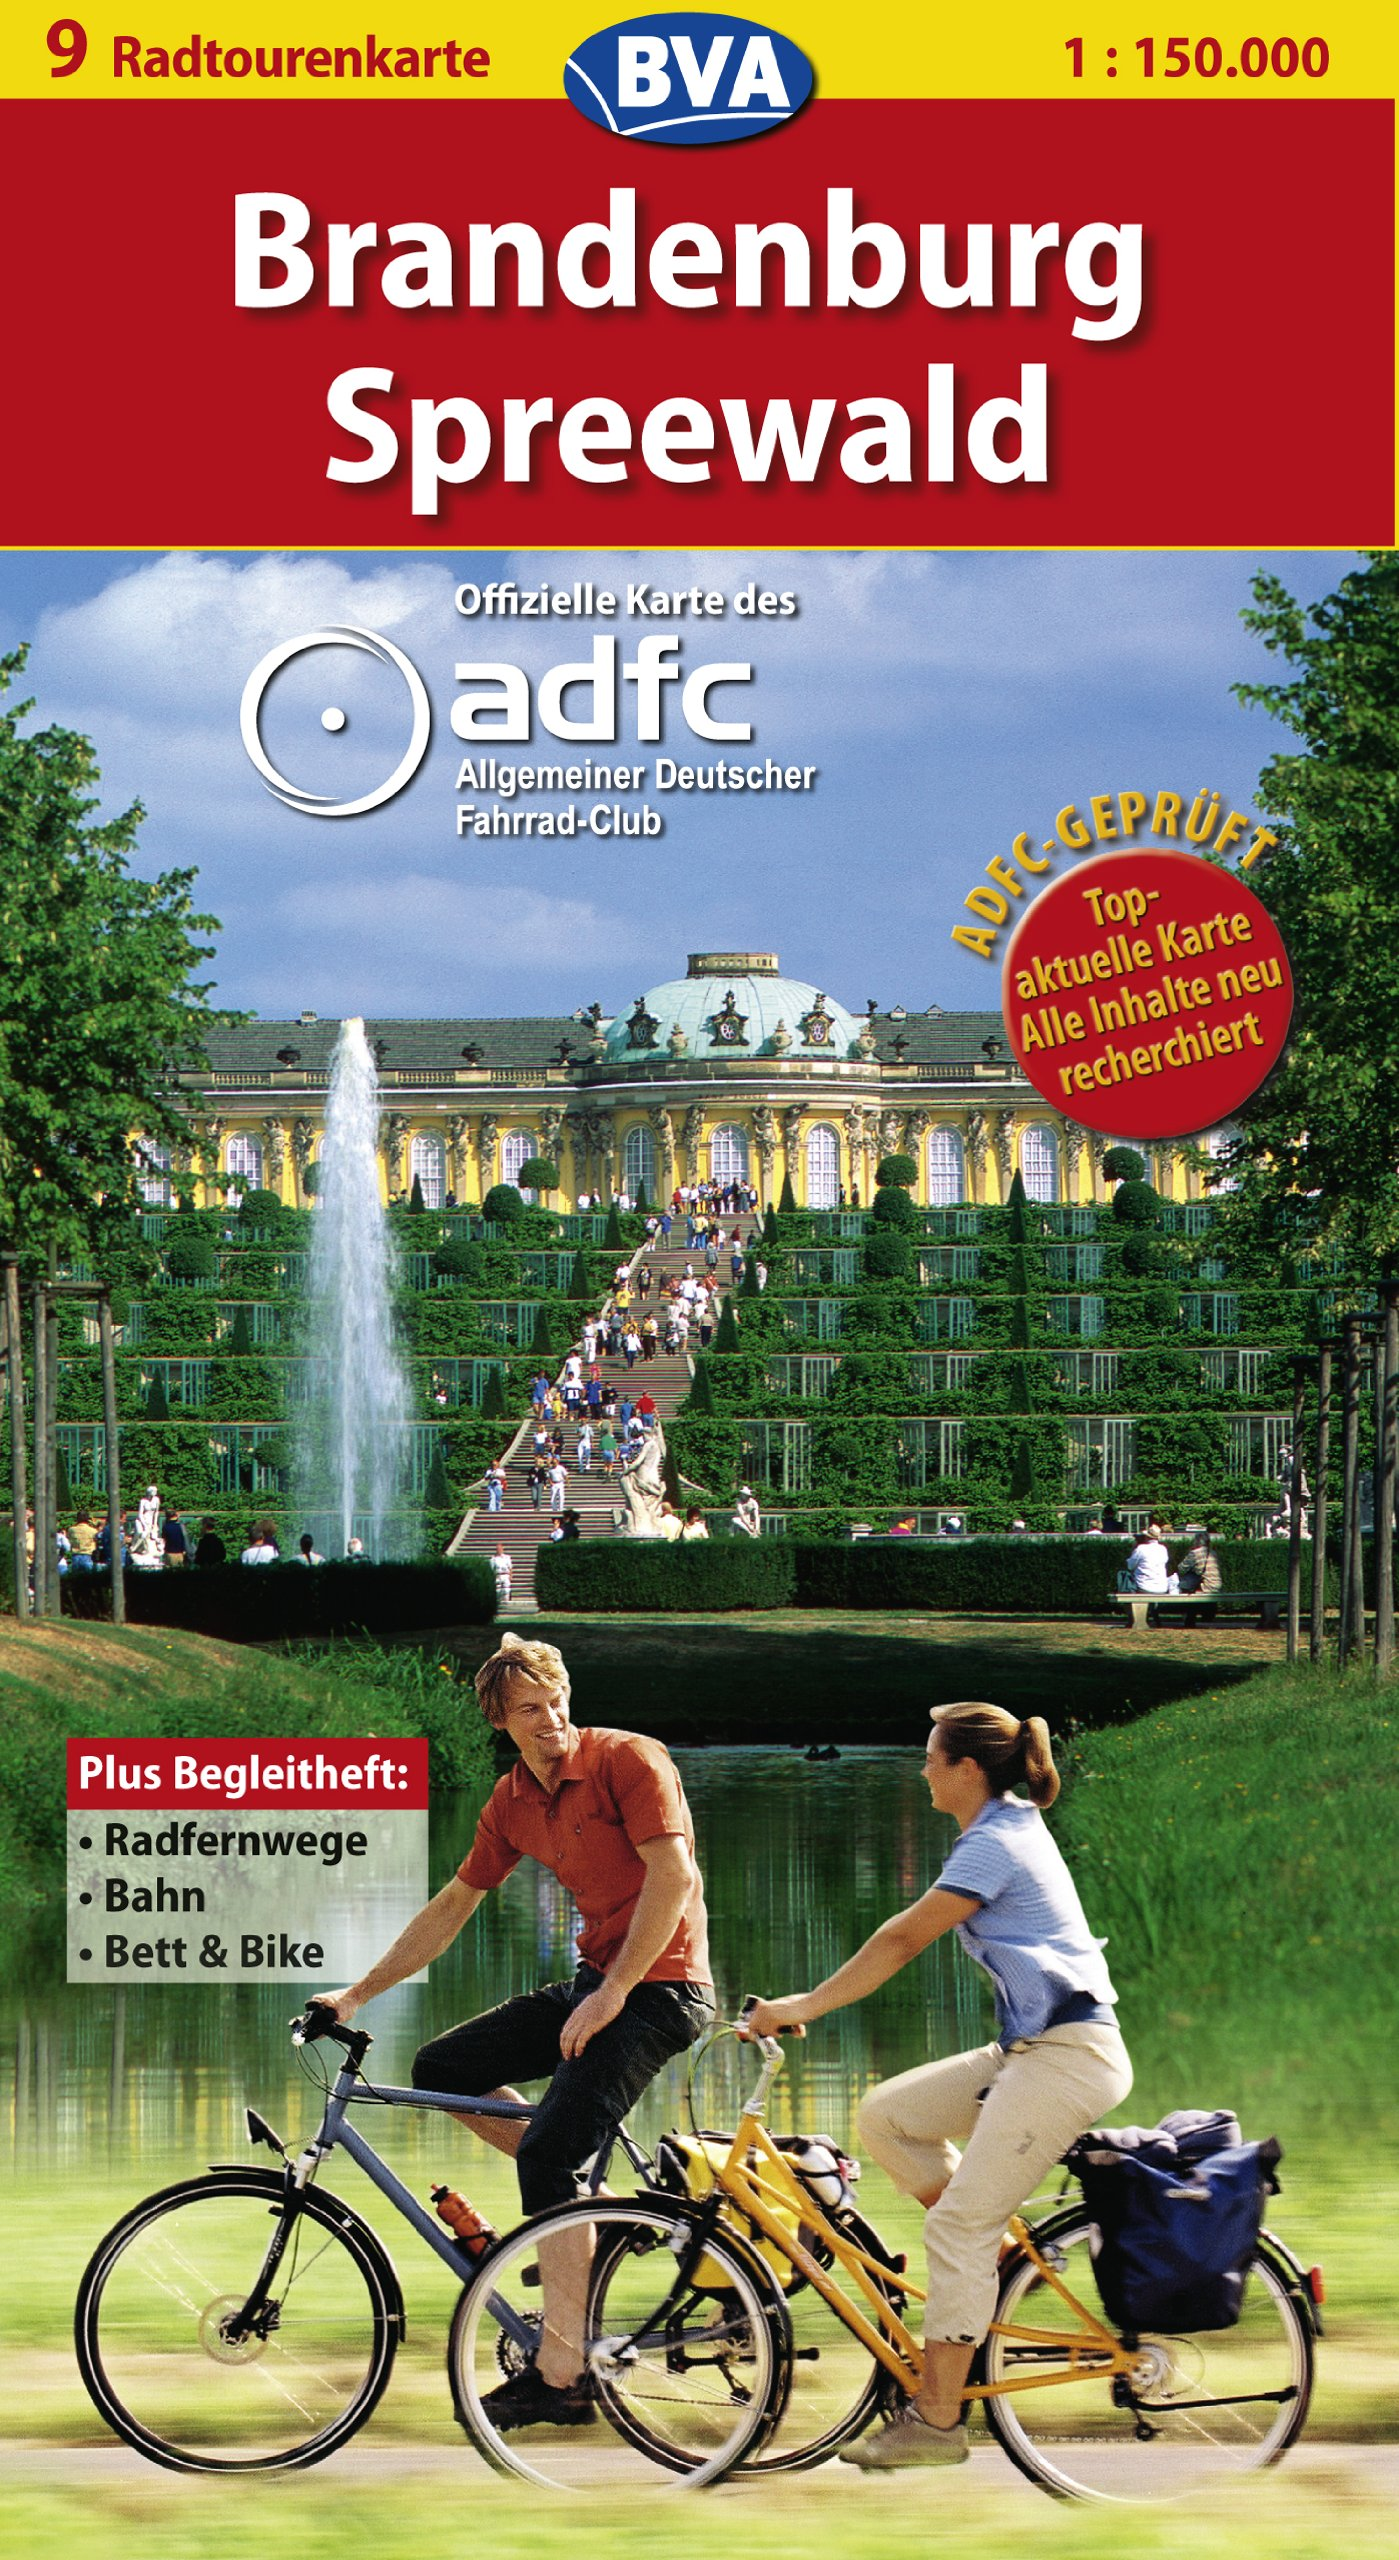 Brandenburg /Spreewald: ADFC-Radtourenkarte 1:150.000